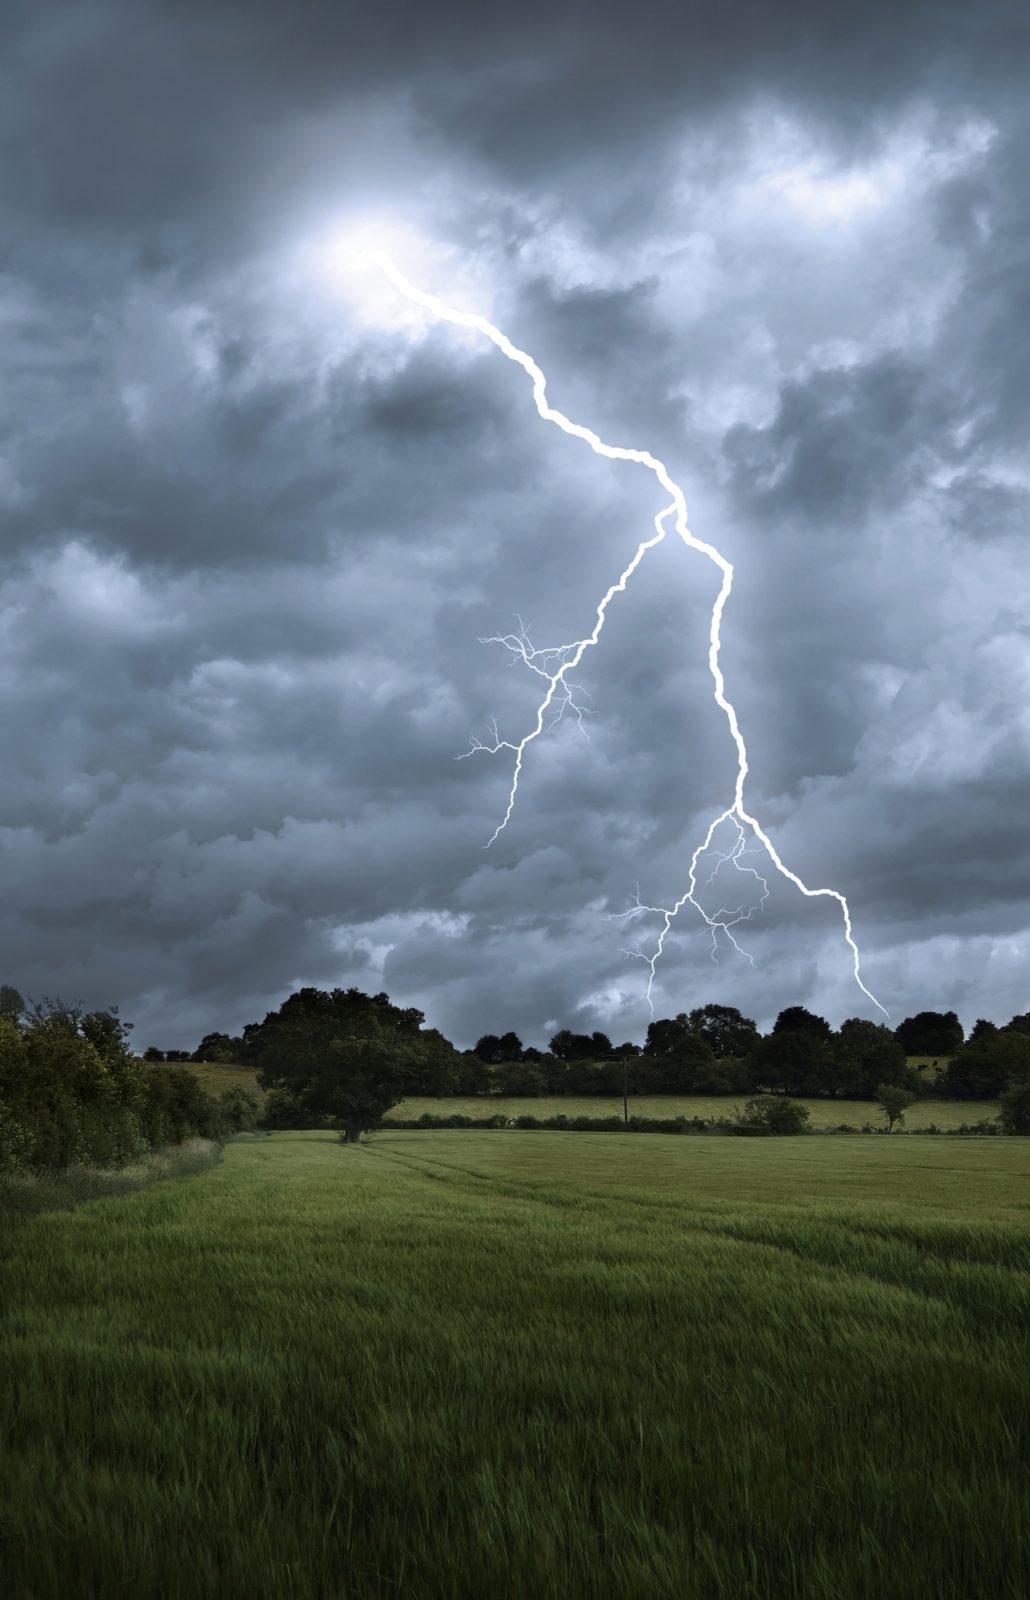 Severe thunderstorm warning in effect for region